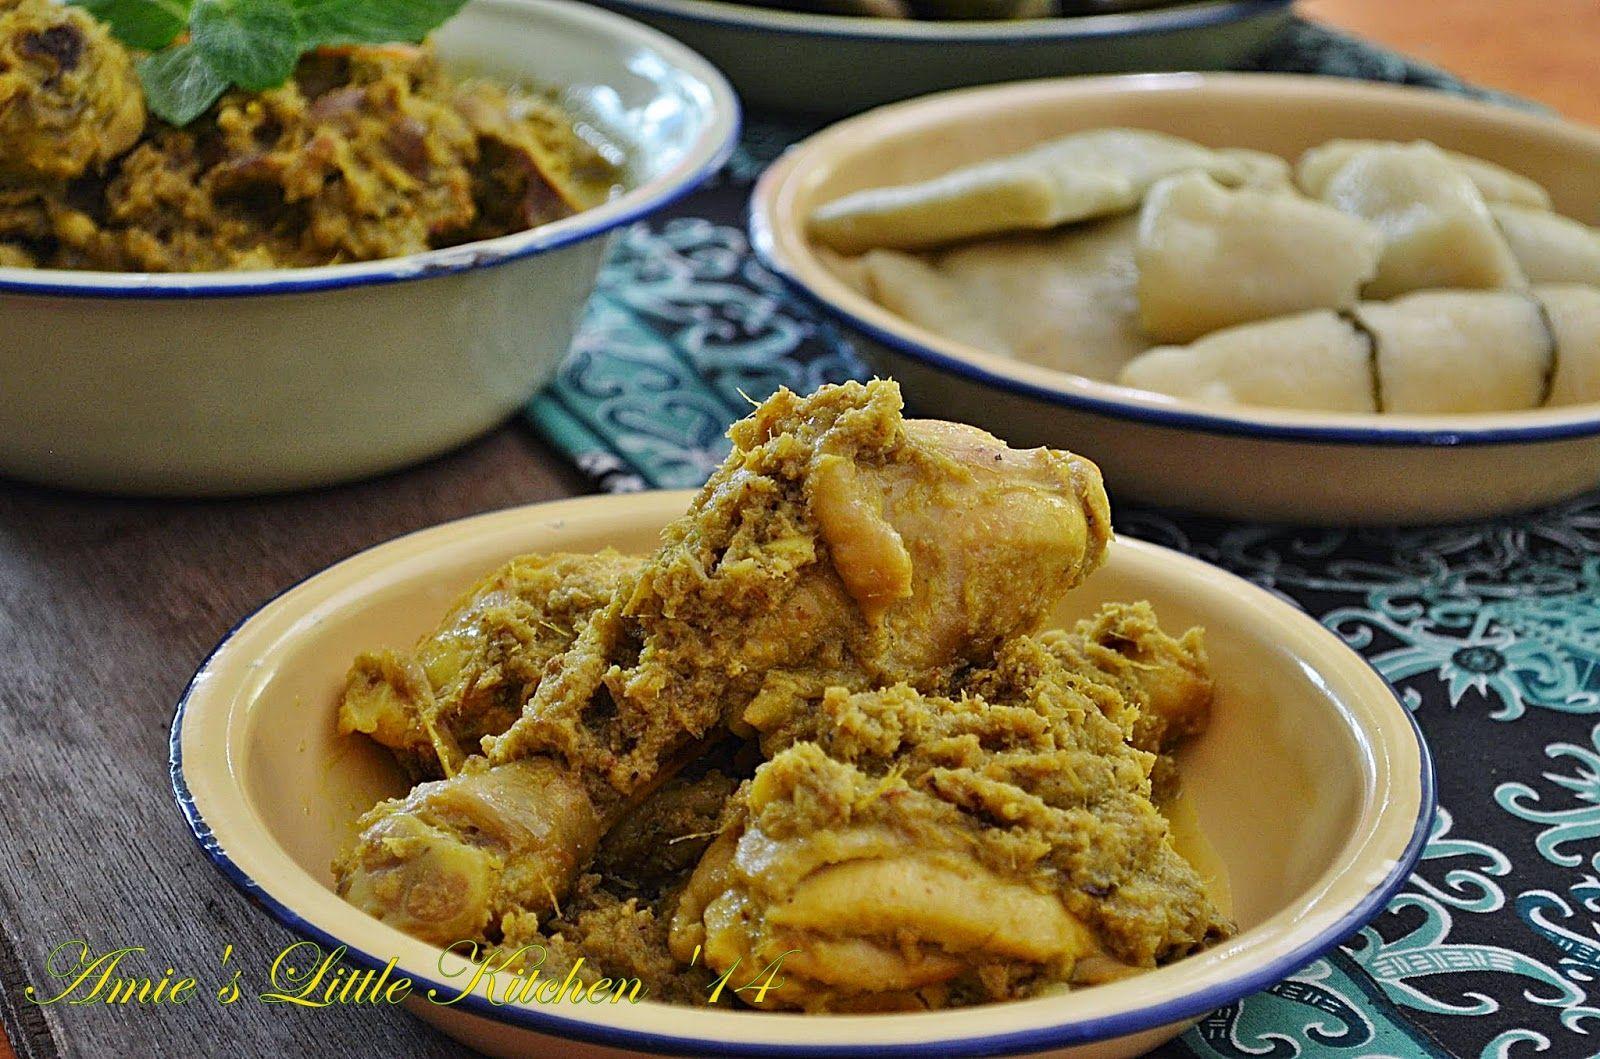 Amie S Little Kitchen Jom Kenali Resepi Ayam Masak Lengkuas Nasu Likku